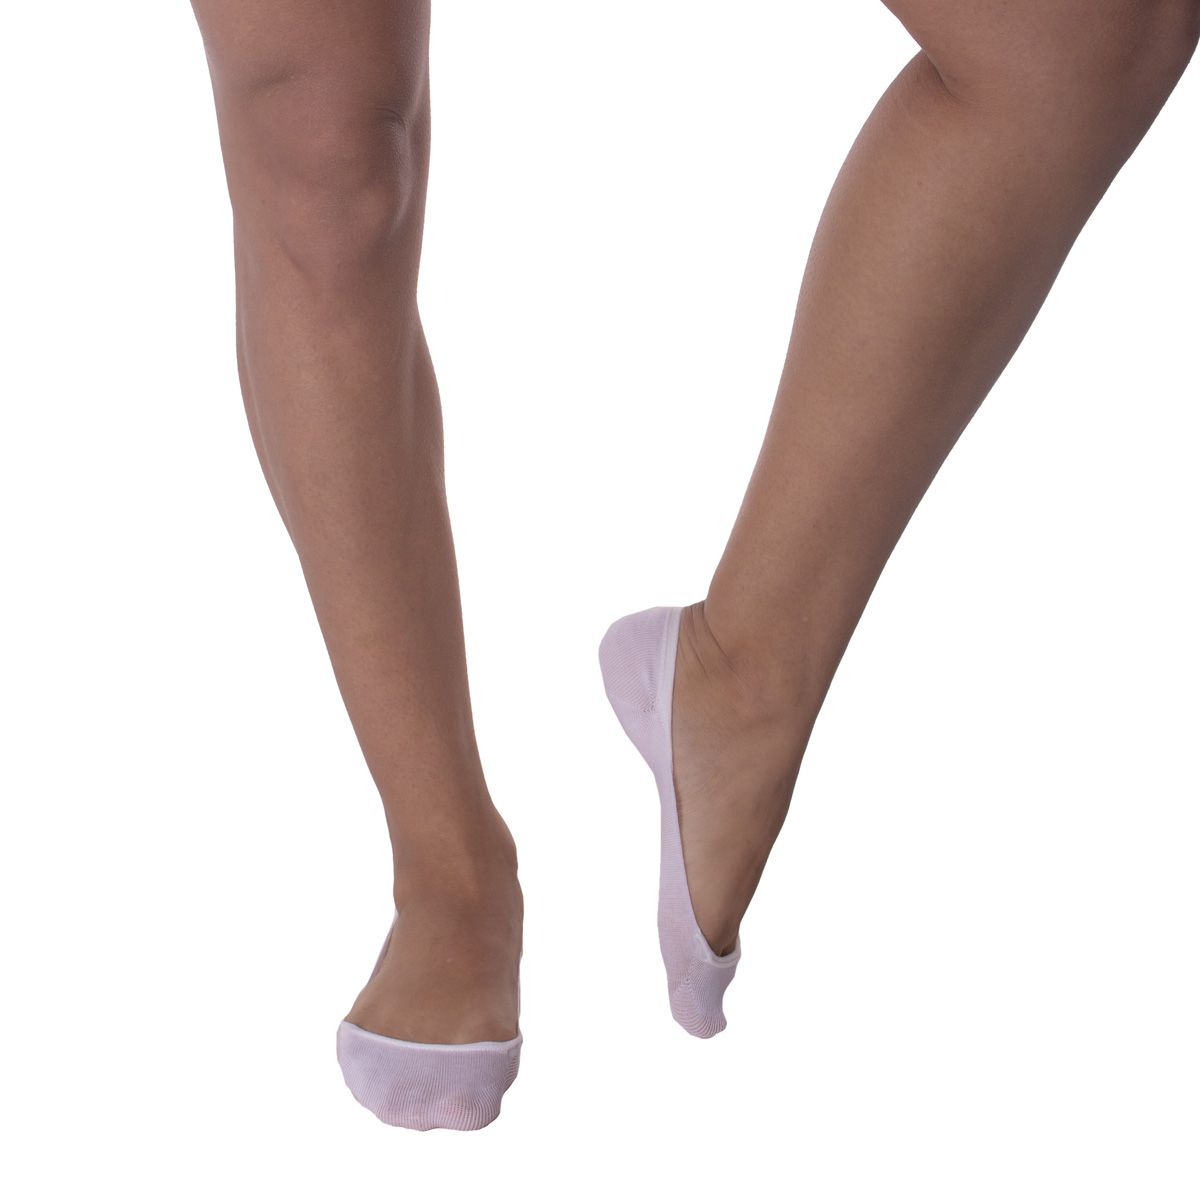 Meia feminina sapatilha super invisível Selene